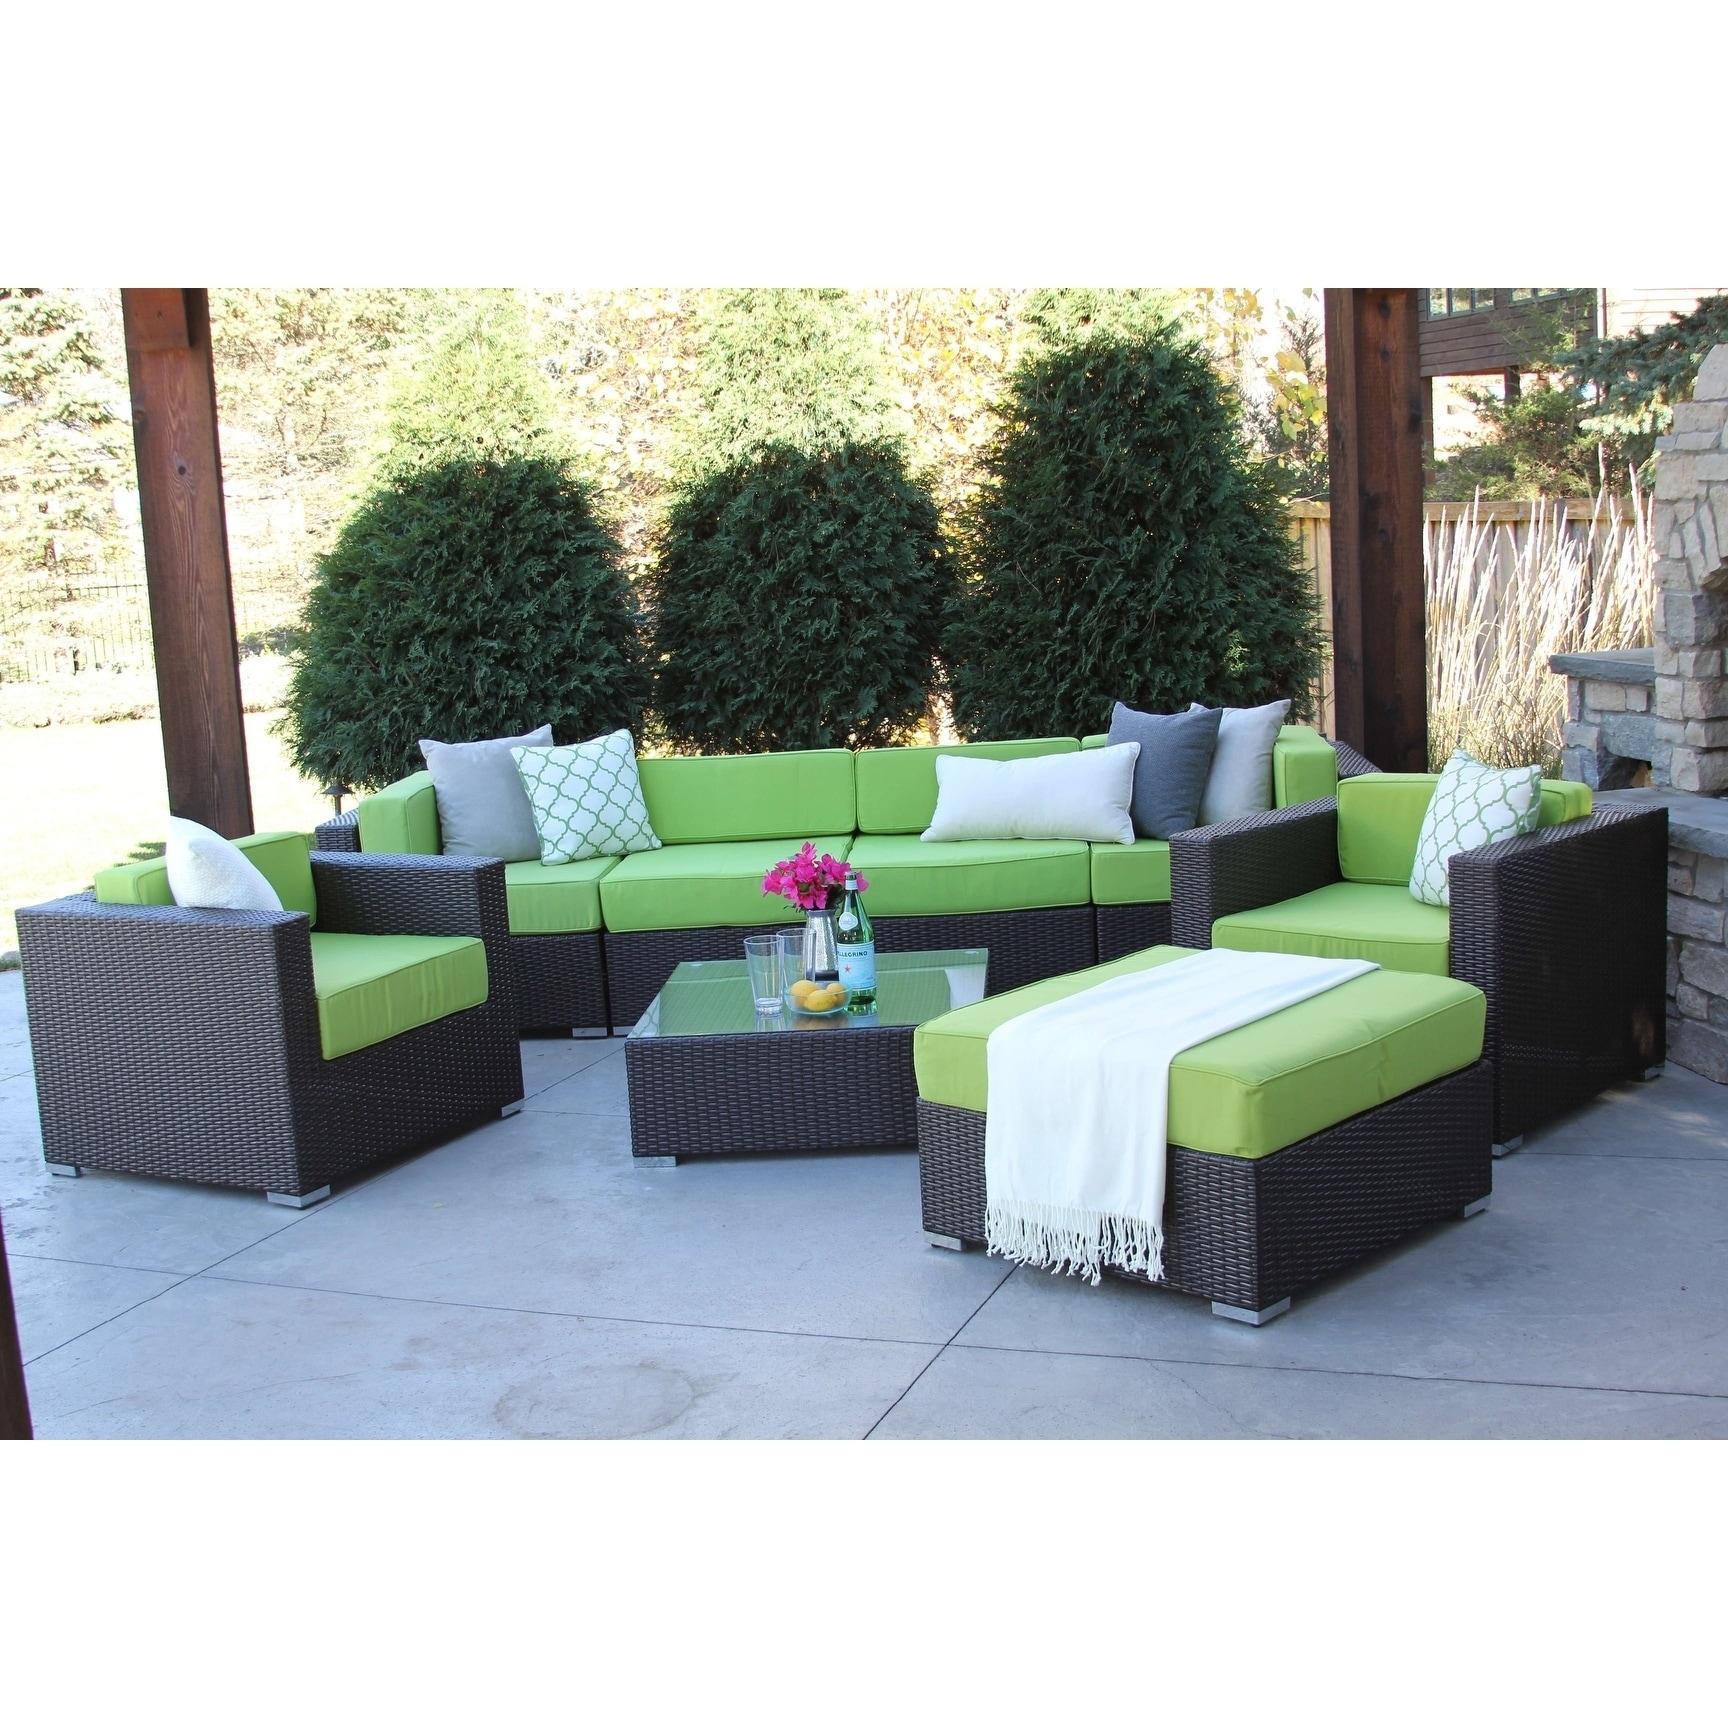 Hiawatha 8 Pc Modern Outdoor Rattan Patio Furniture Sofa Set Modular Free Shipping Today 23121427